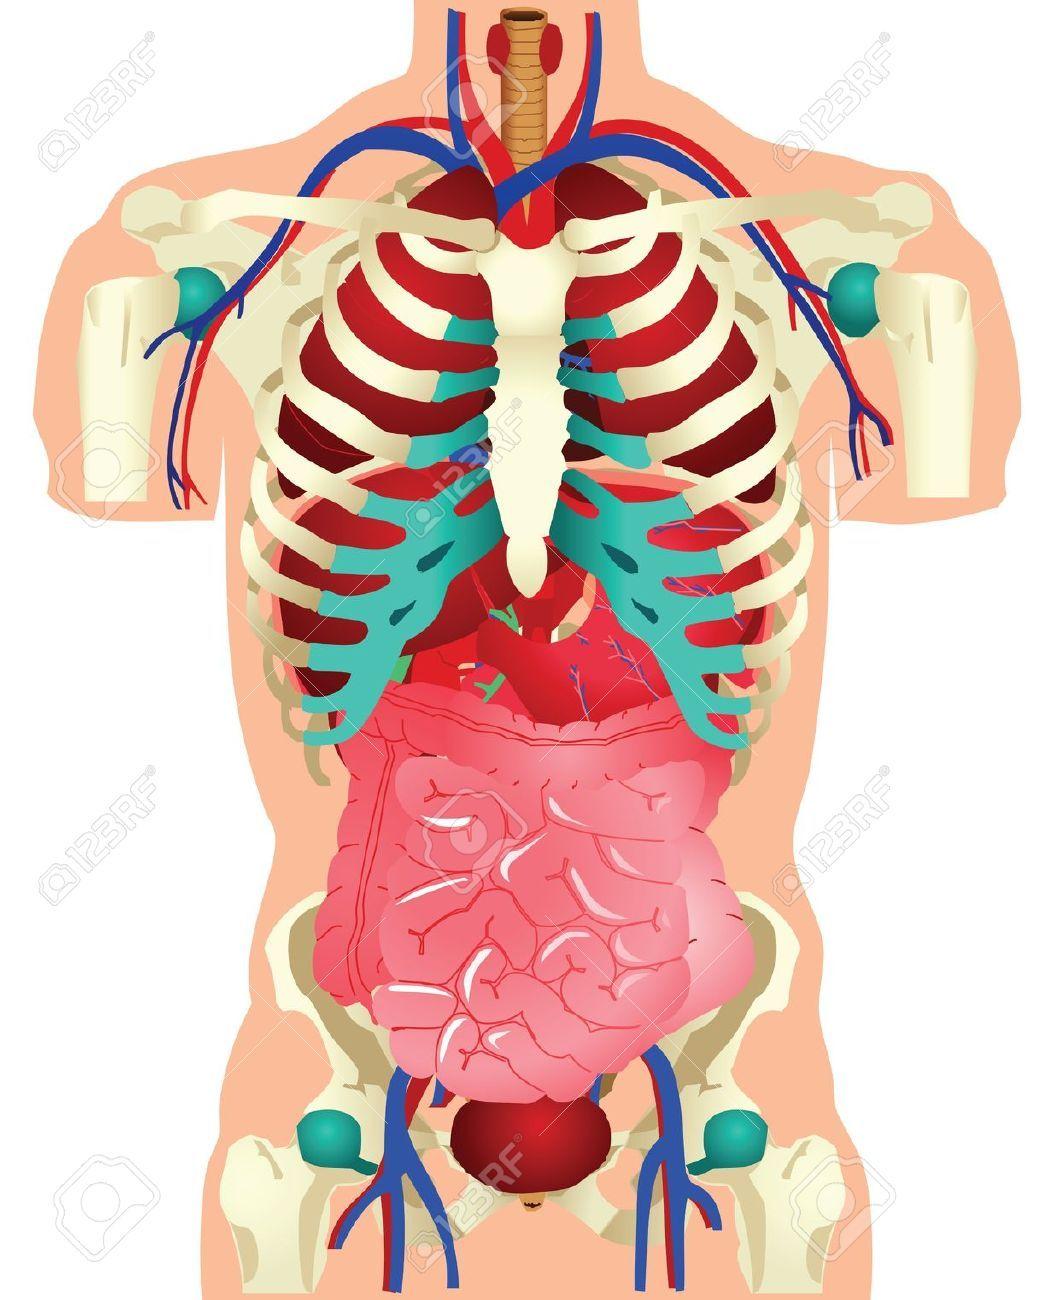 Free human anatomy clipart. Portal